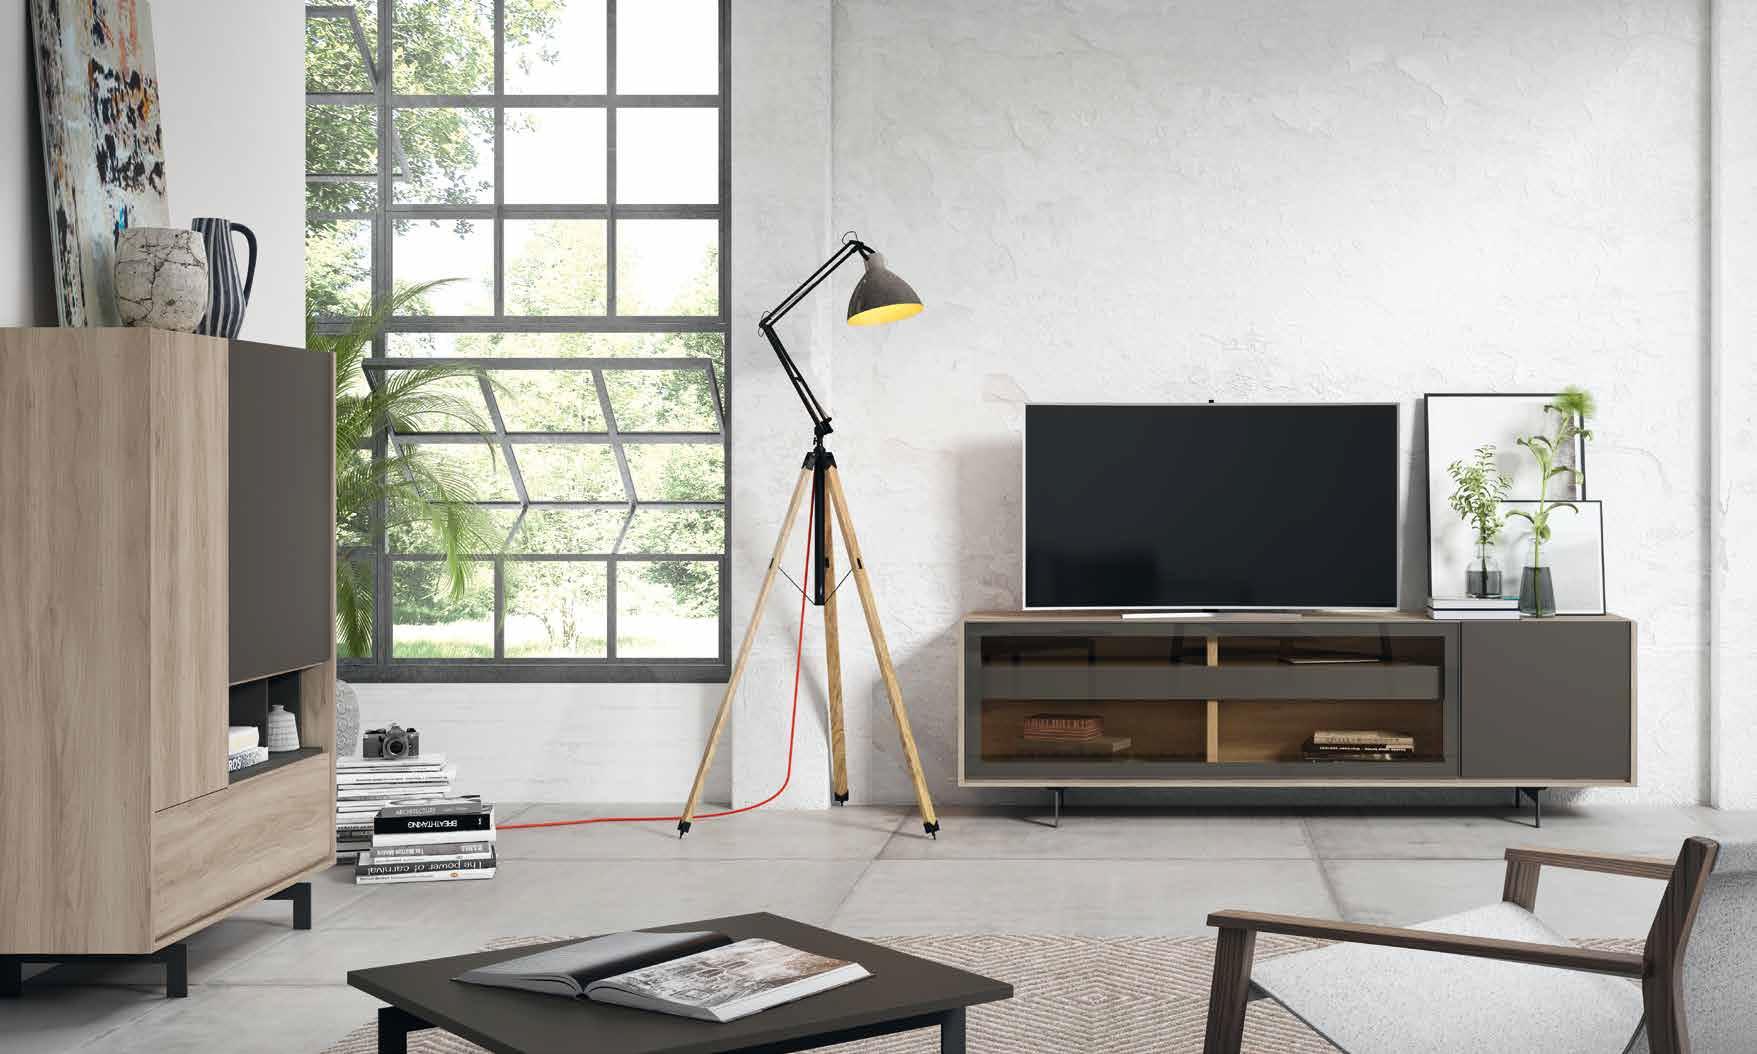 salon-moderno-Nativ-2019-muebles-paco-caballero-0920-5c8ceaae2bae7